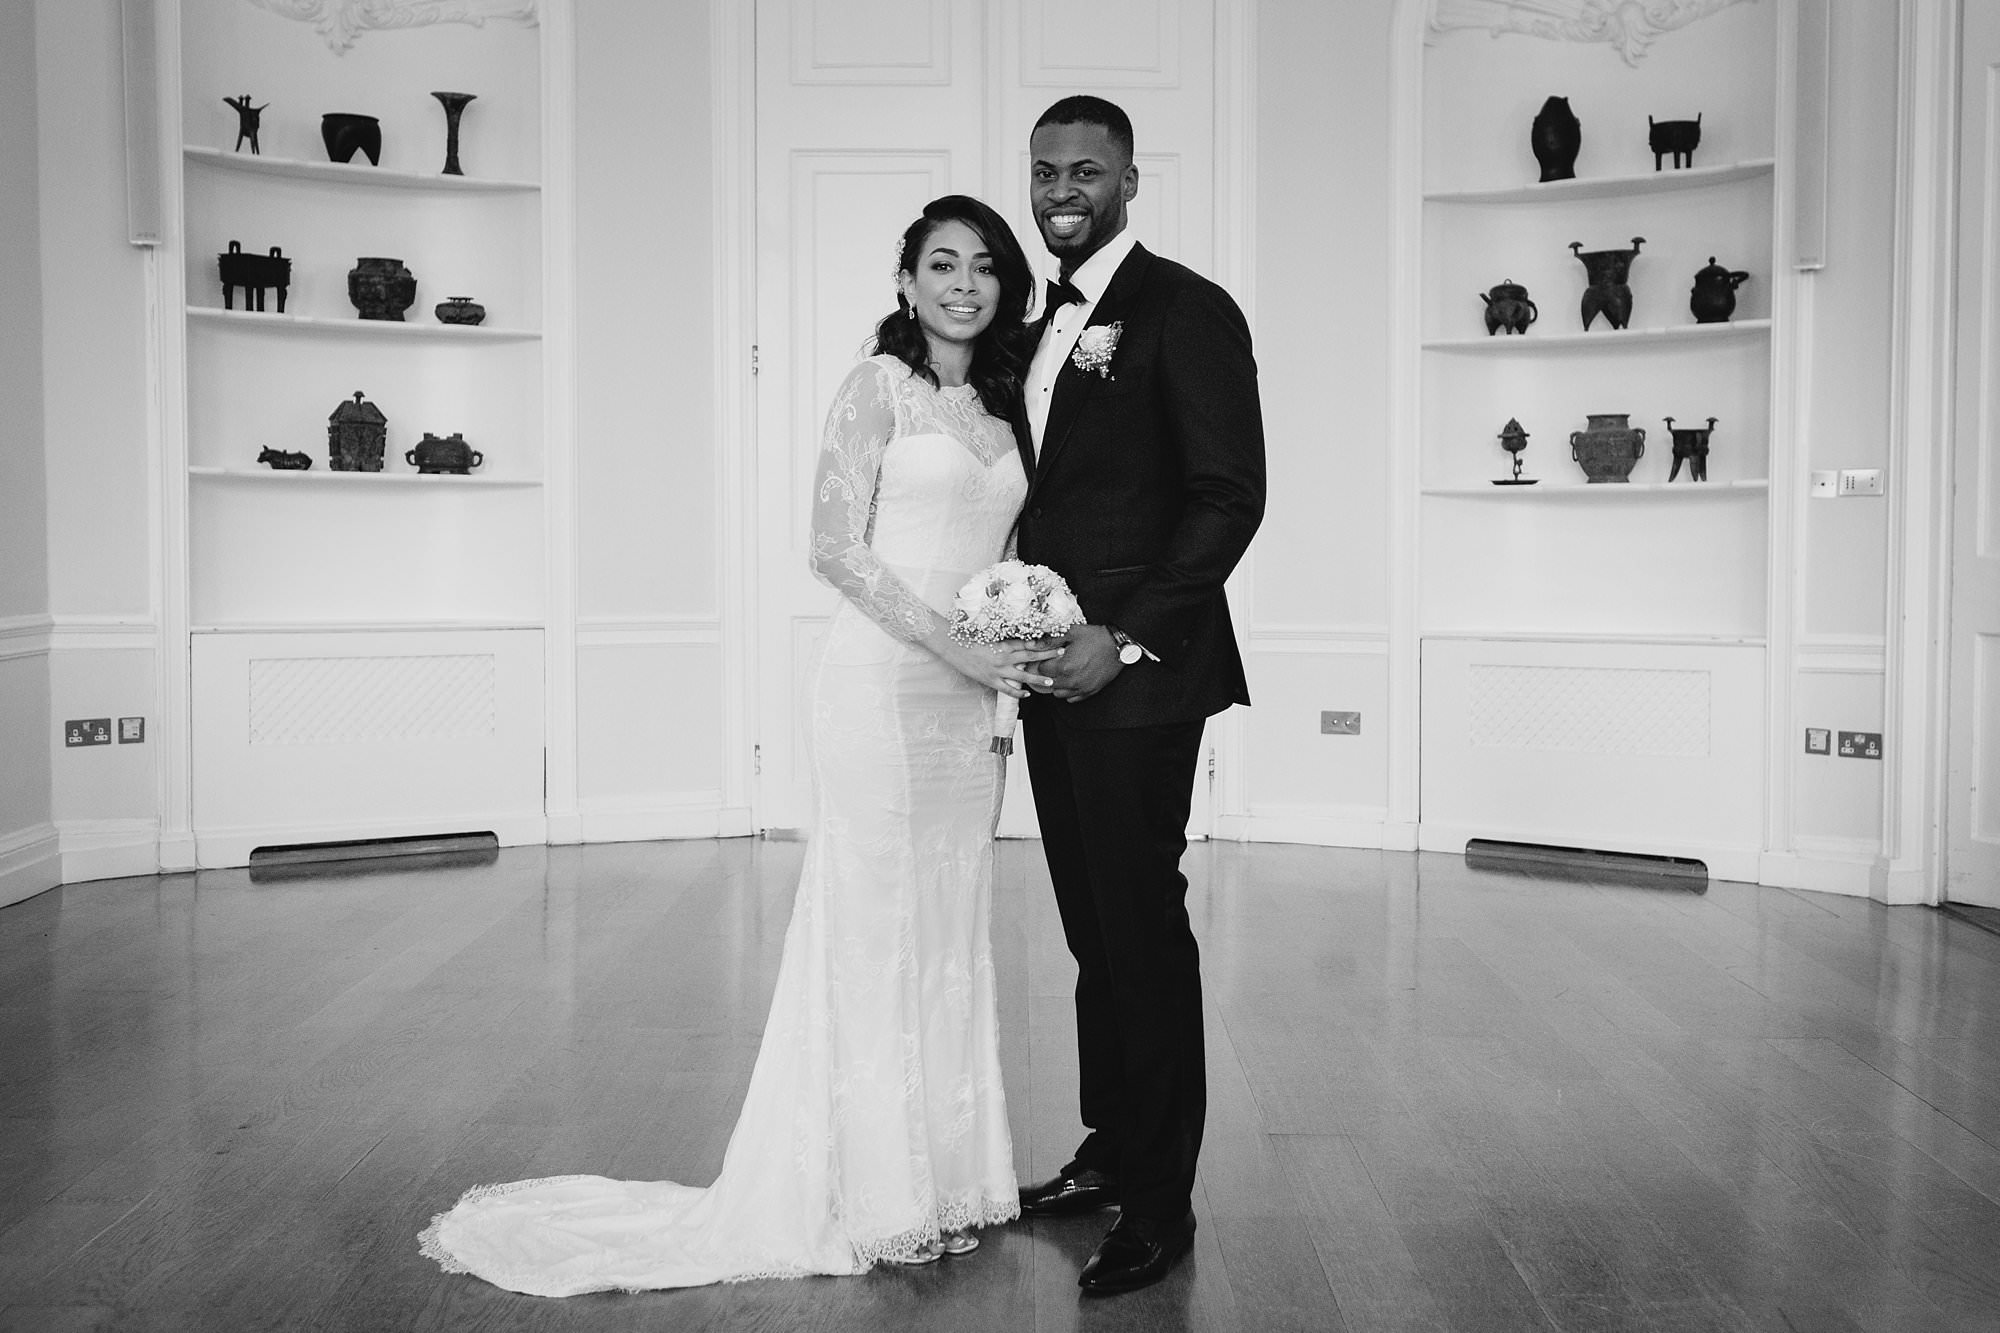 asia house london wedding photographer 011 - Rachel + Gabriel   Asia House Wedding Photography